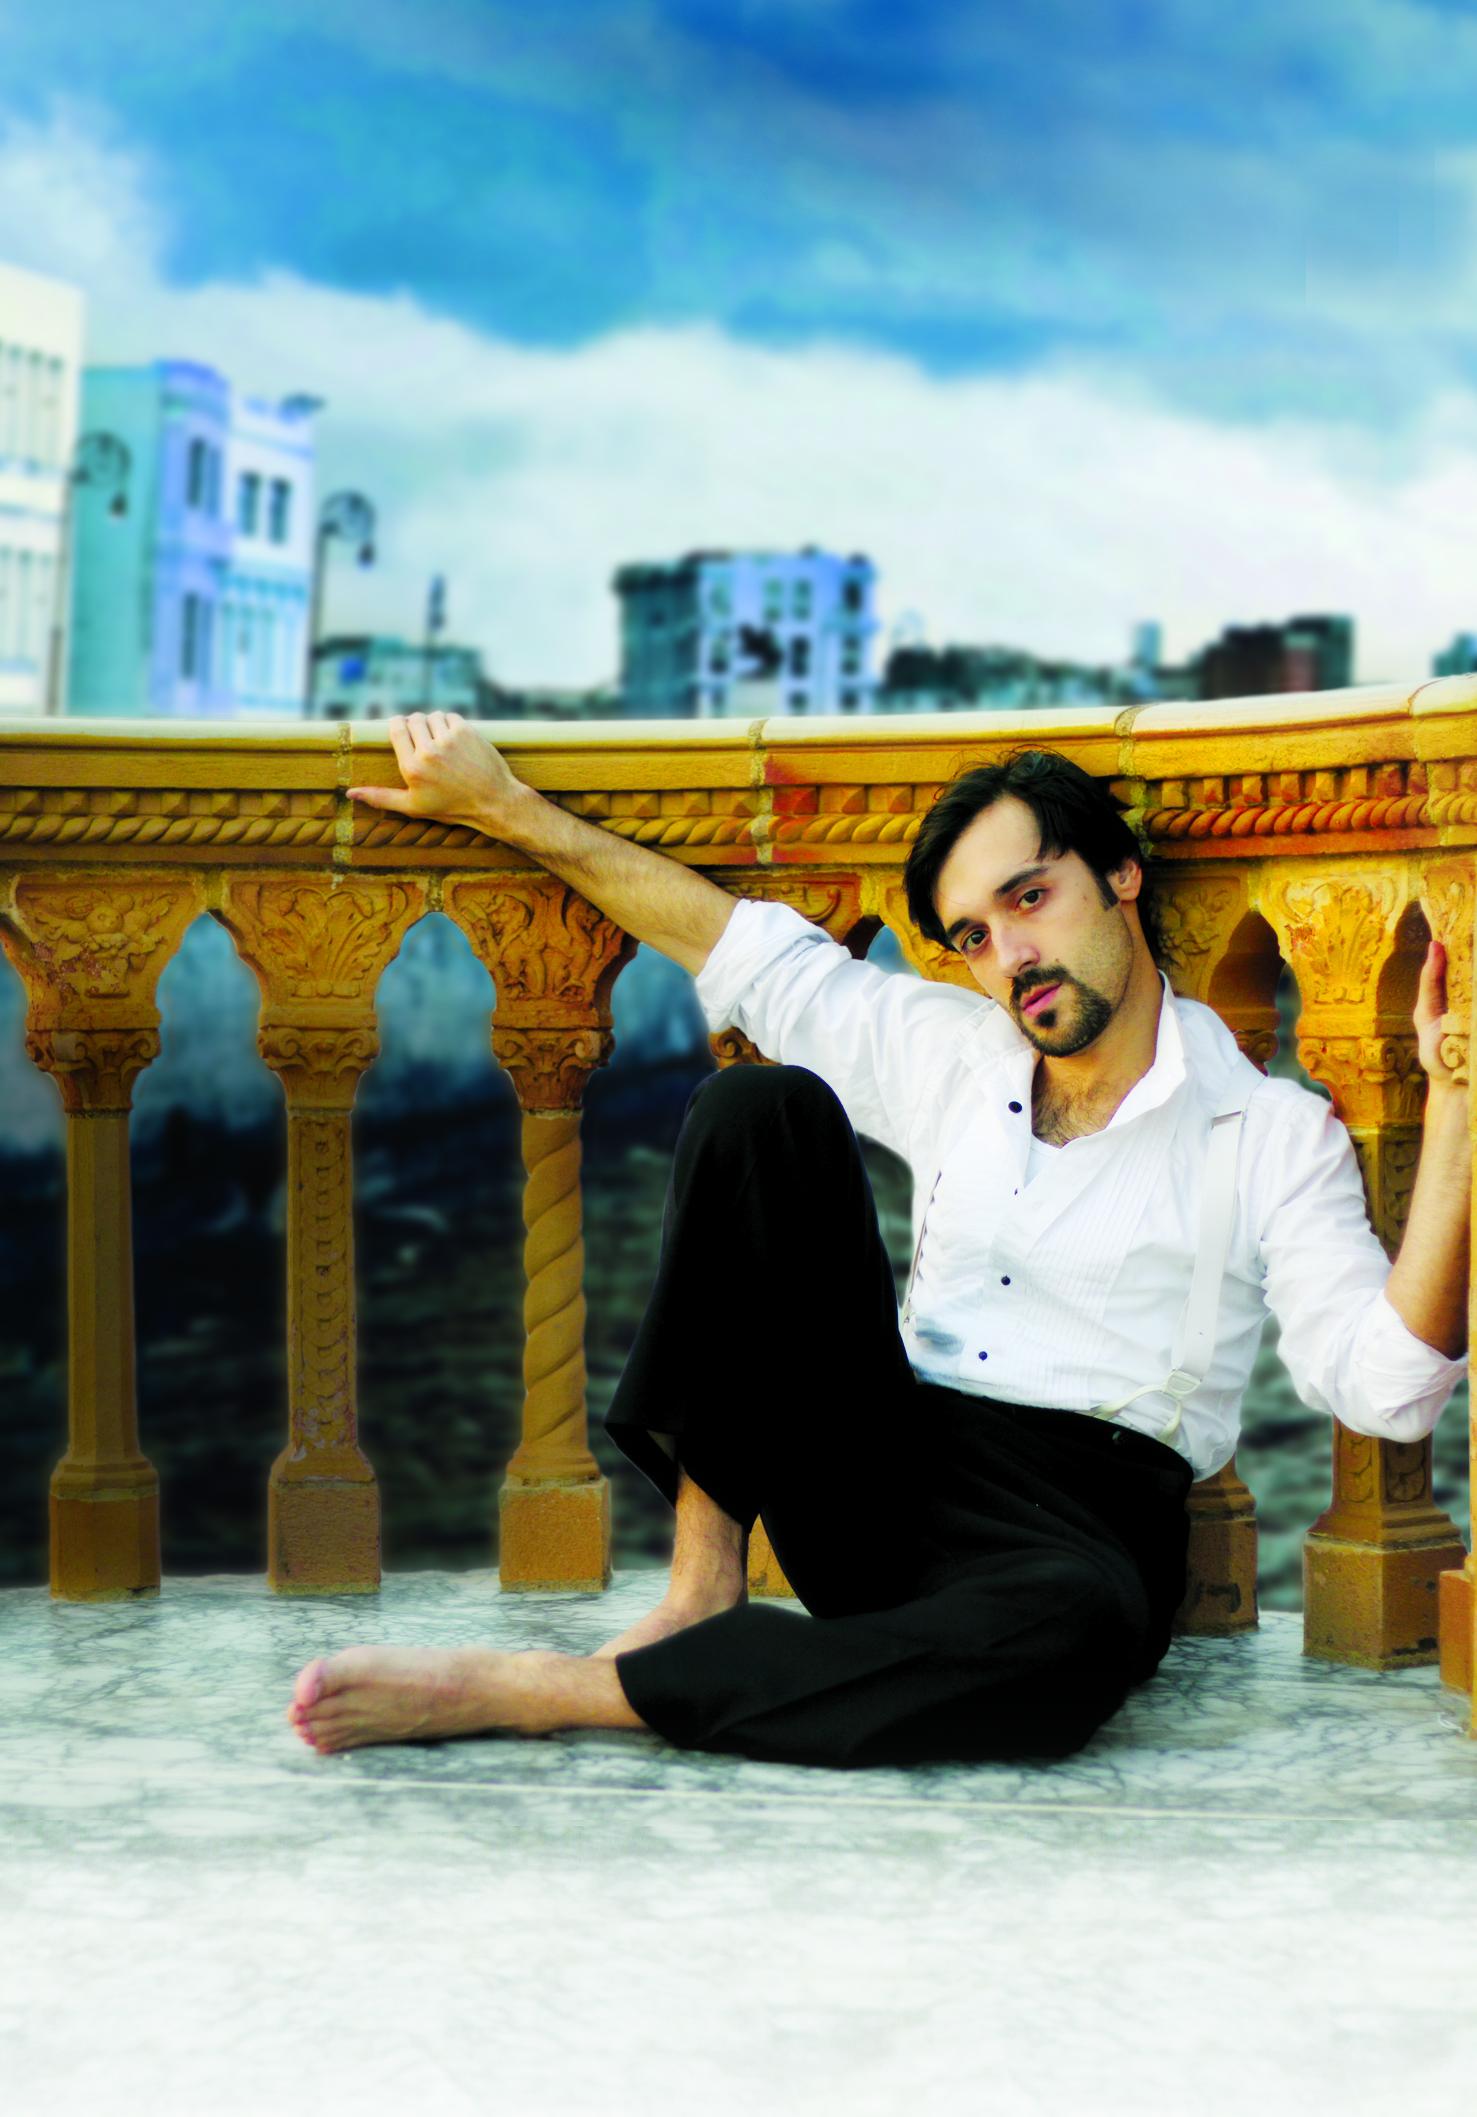 Miami native Frankie J. Alvarez as the title character in Hmlet, Prince of Cuba